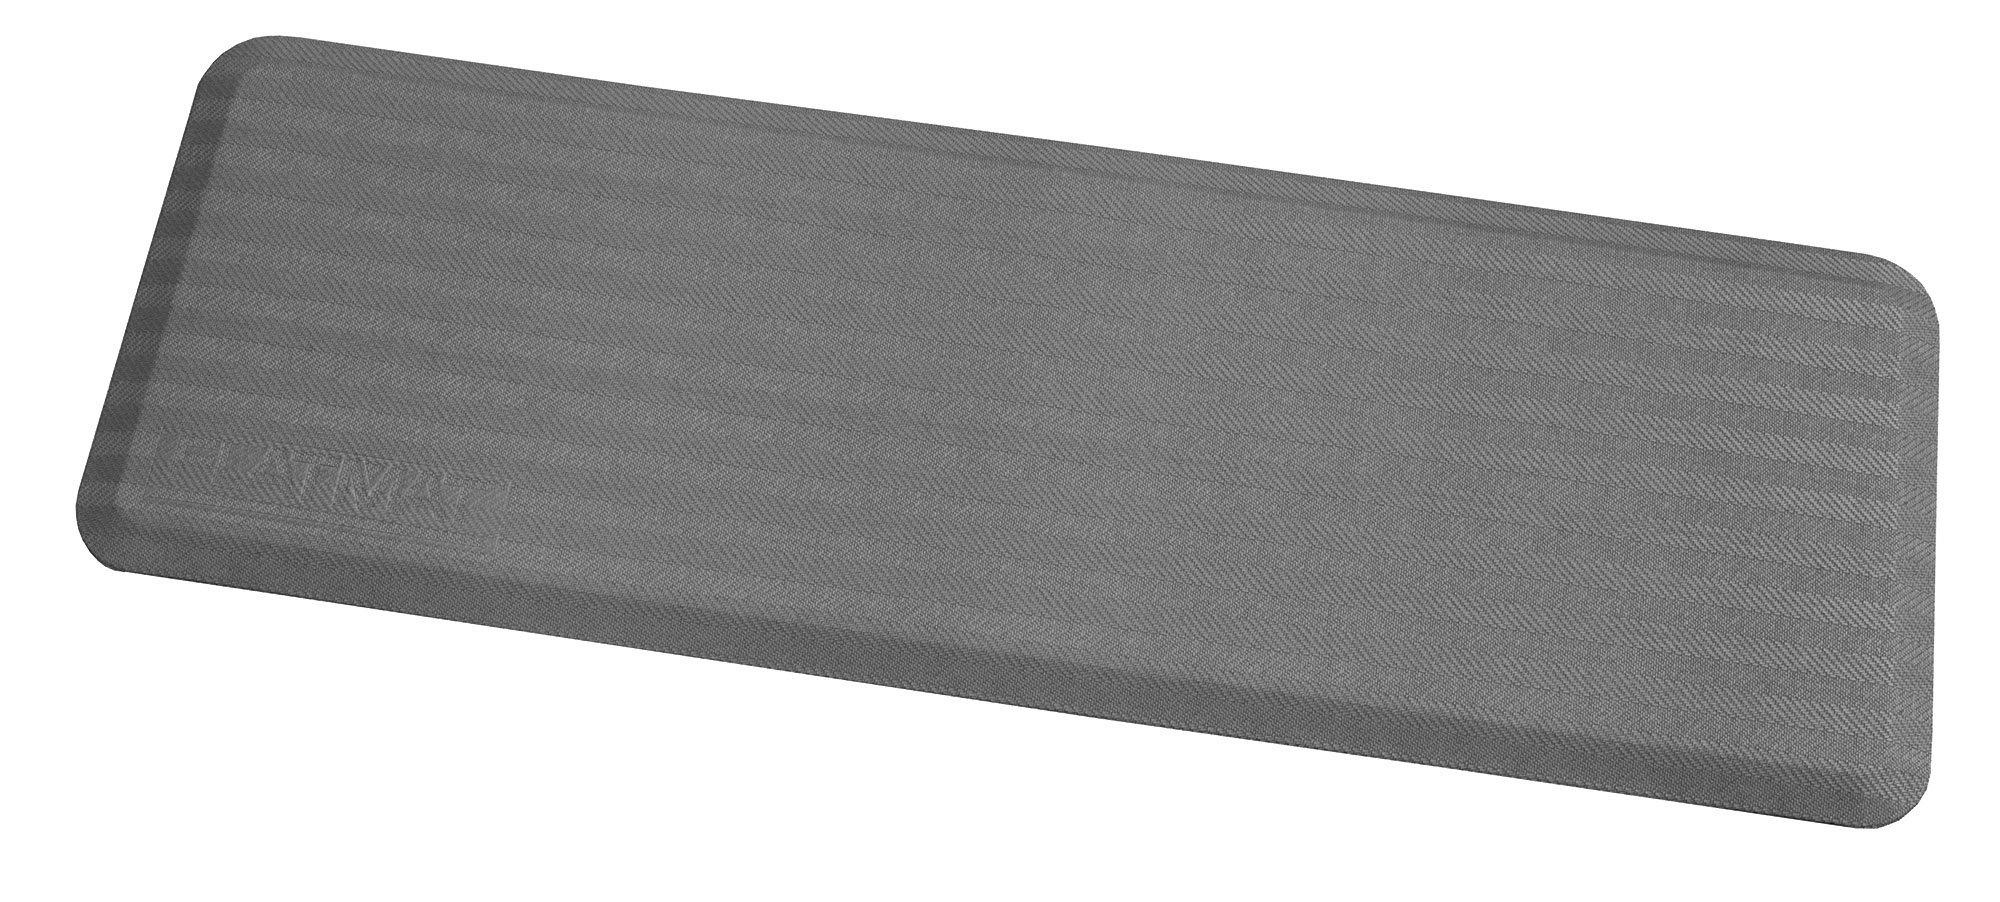 Arrowhead Healthcare Supply P-107350-24-05 FLATMAT, 24'' Wide, Bedside Fall Mat, Cool Grey, Woven Pattern